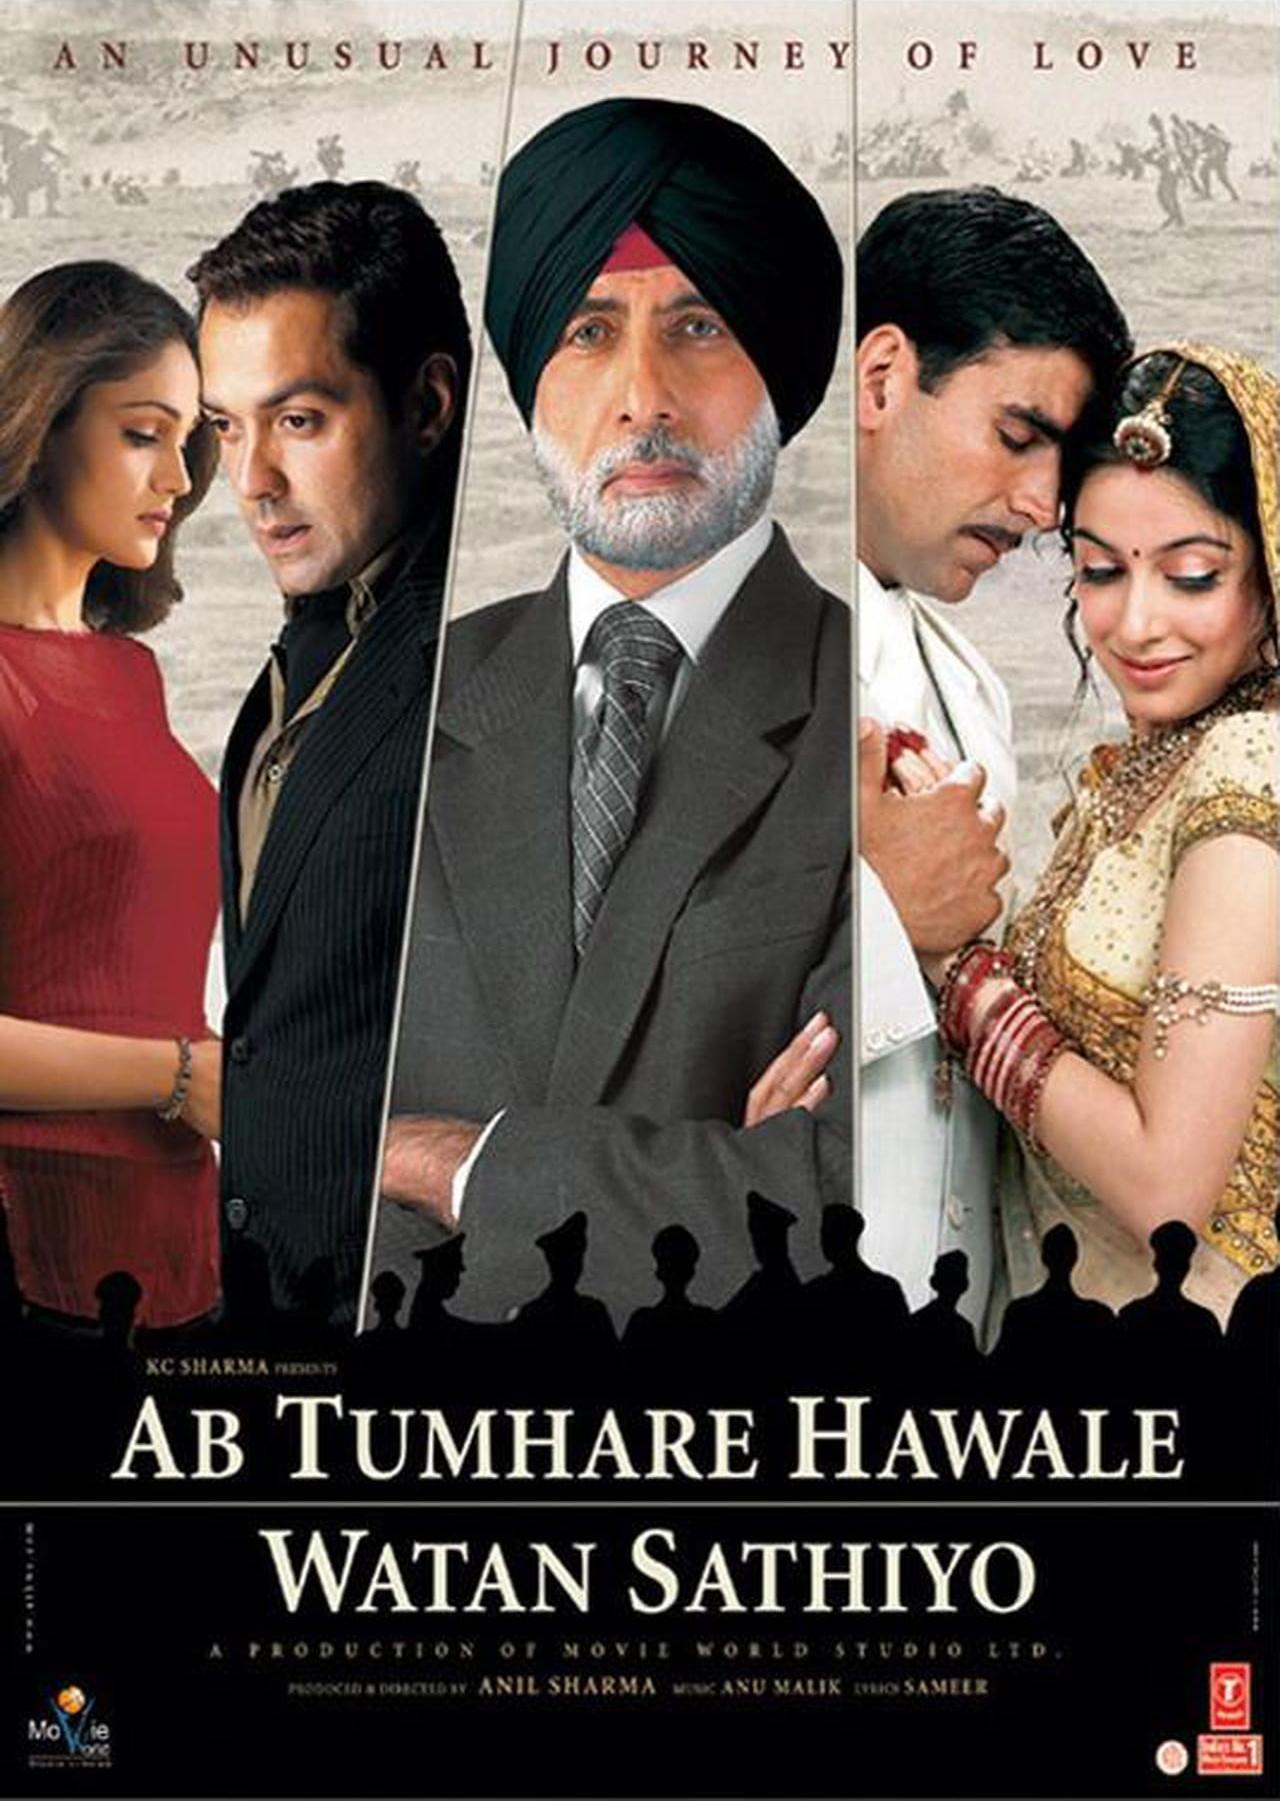 Ab Tumhare Hawale Watan Sathiyo Hindi Dubbed 720p Movies Purana